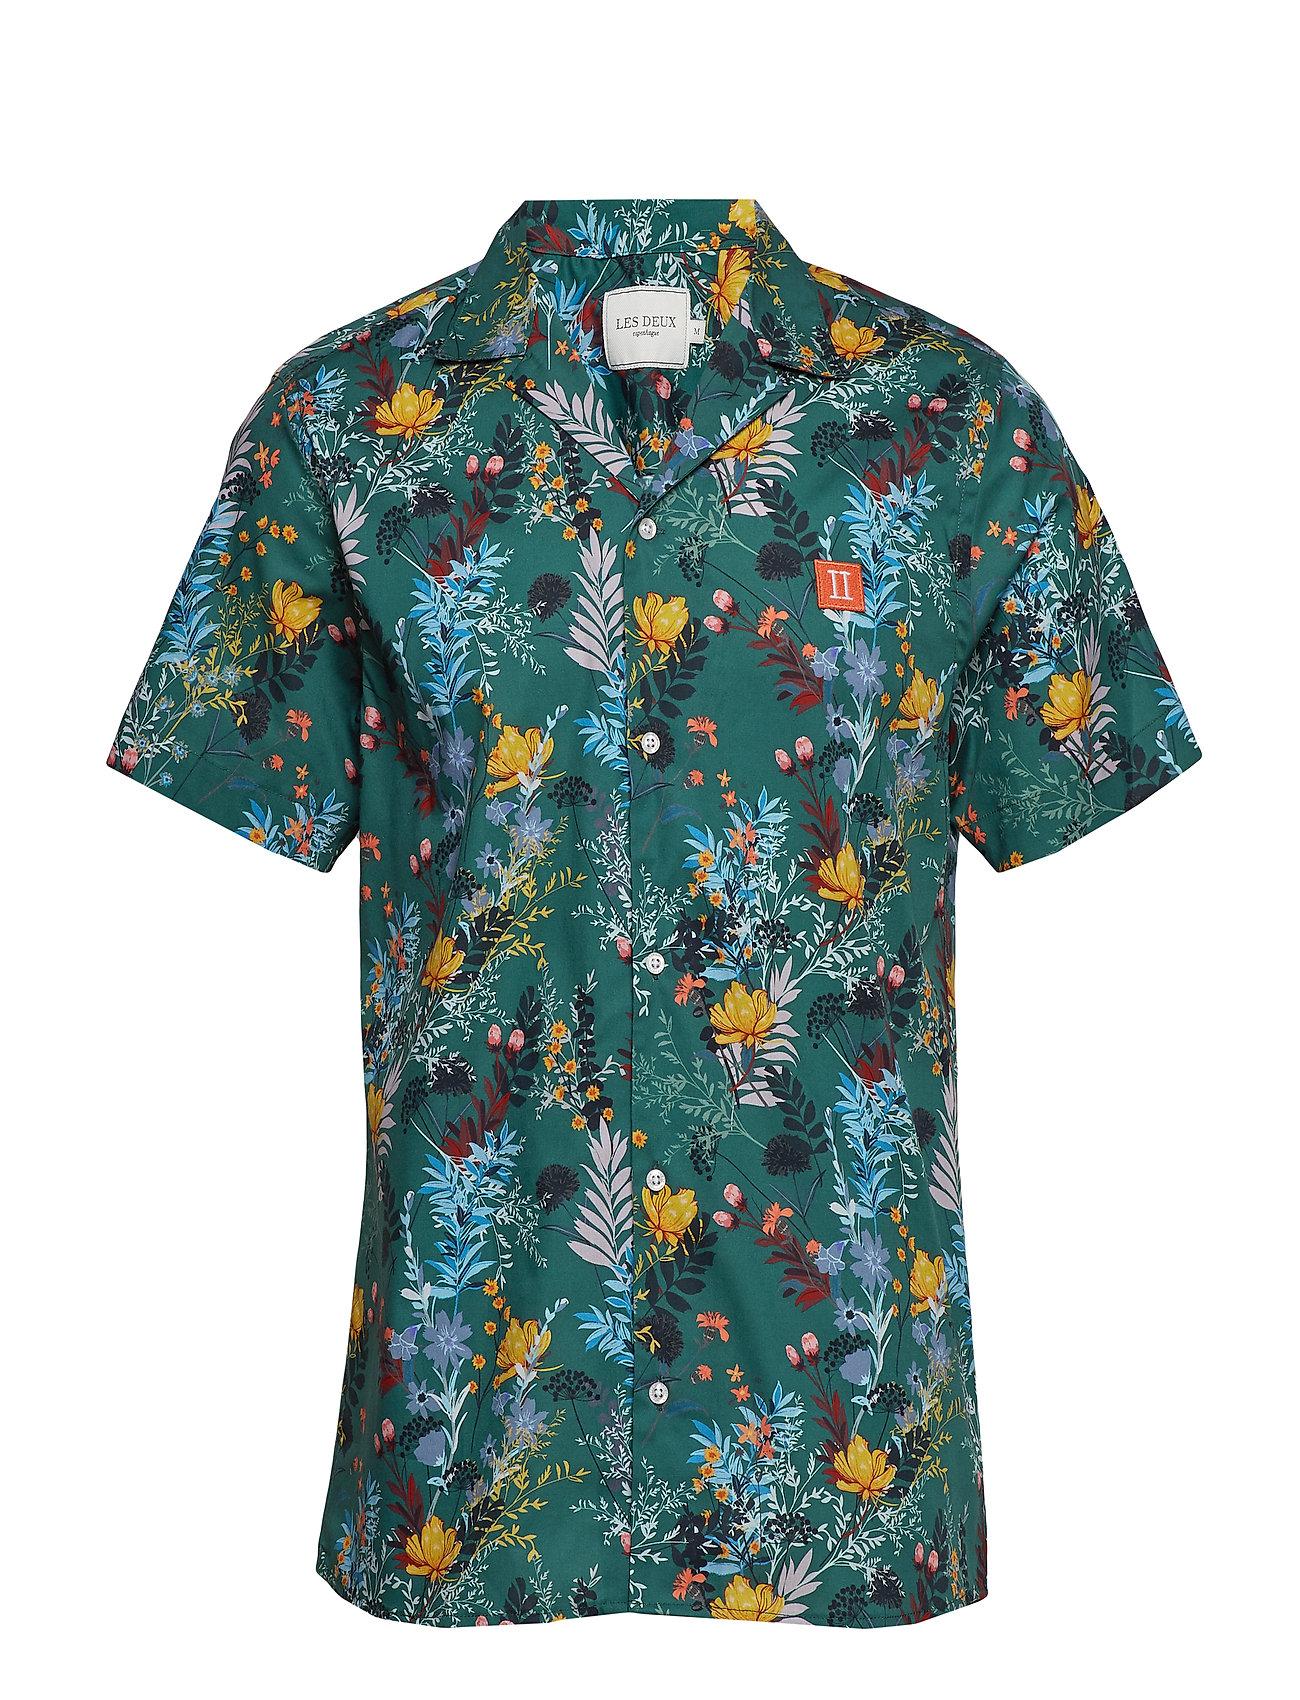 Les Deux Boozt SS Shirt - DARK PETROL BLUE